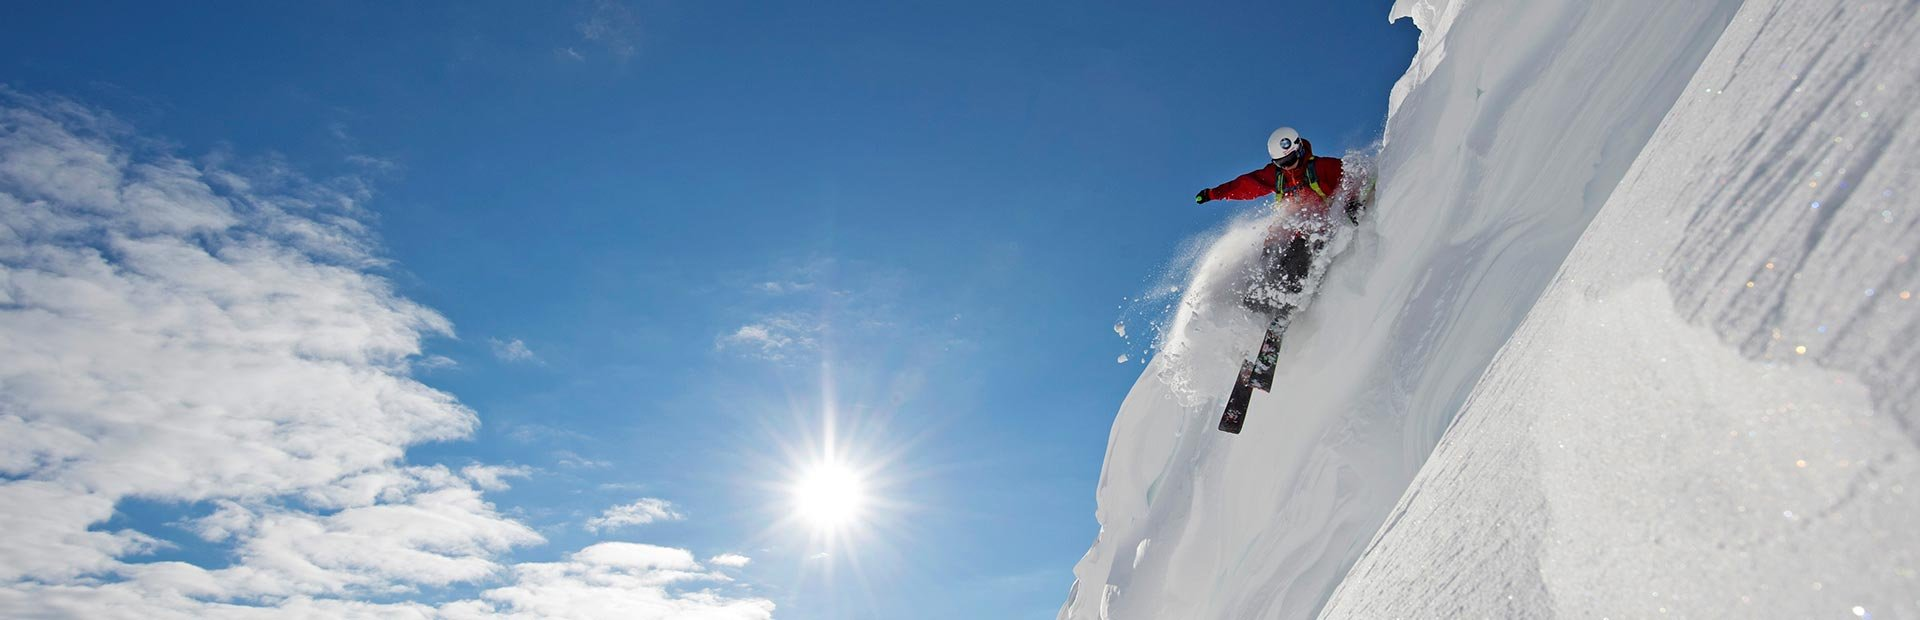 Zillertal Tirol Tiefschnee Schneewechten Schnee